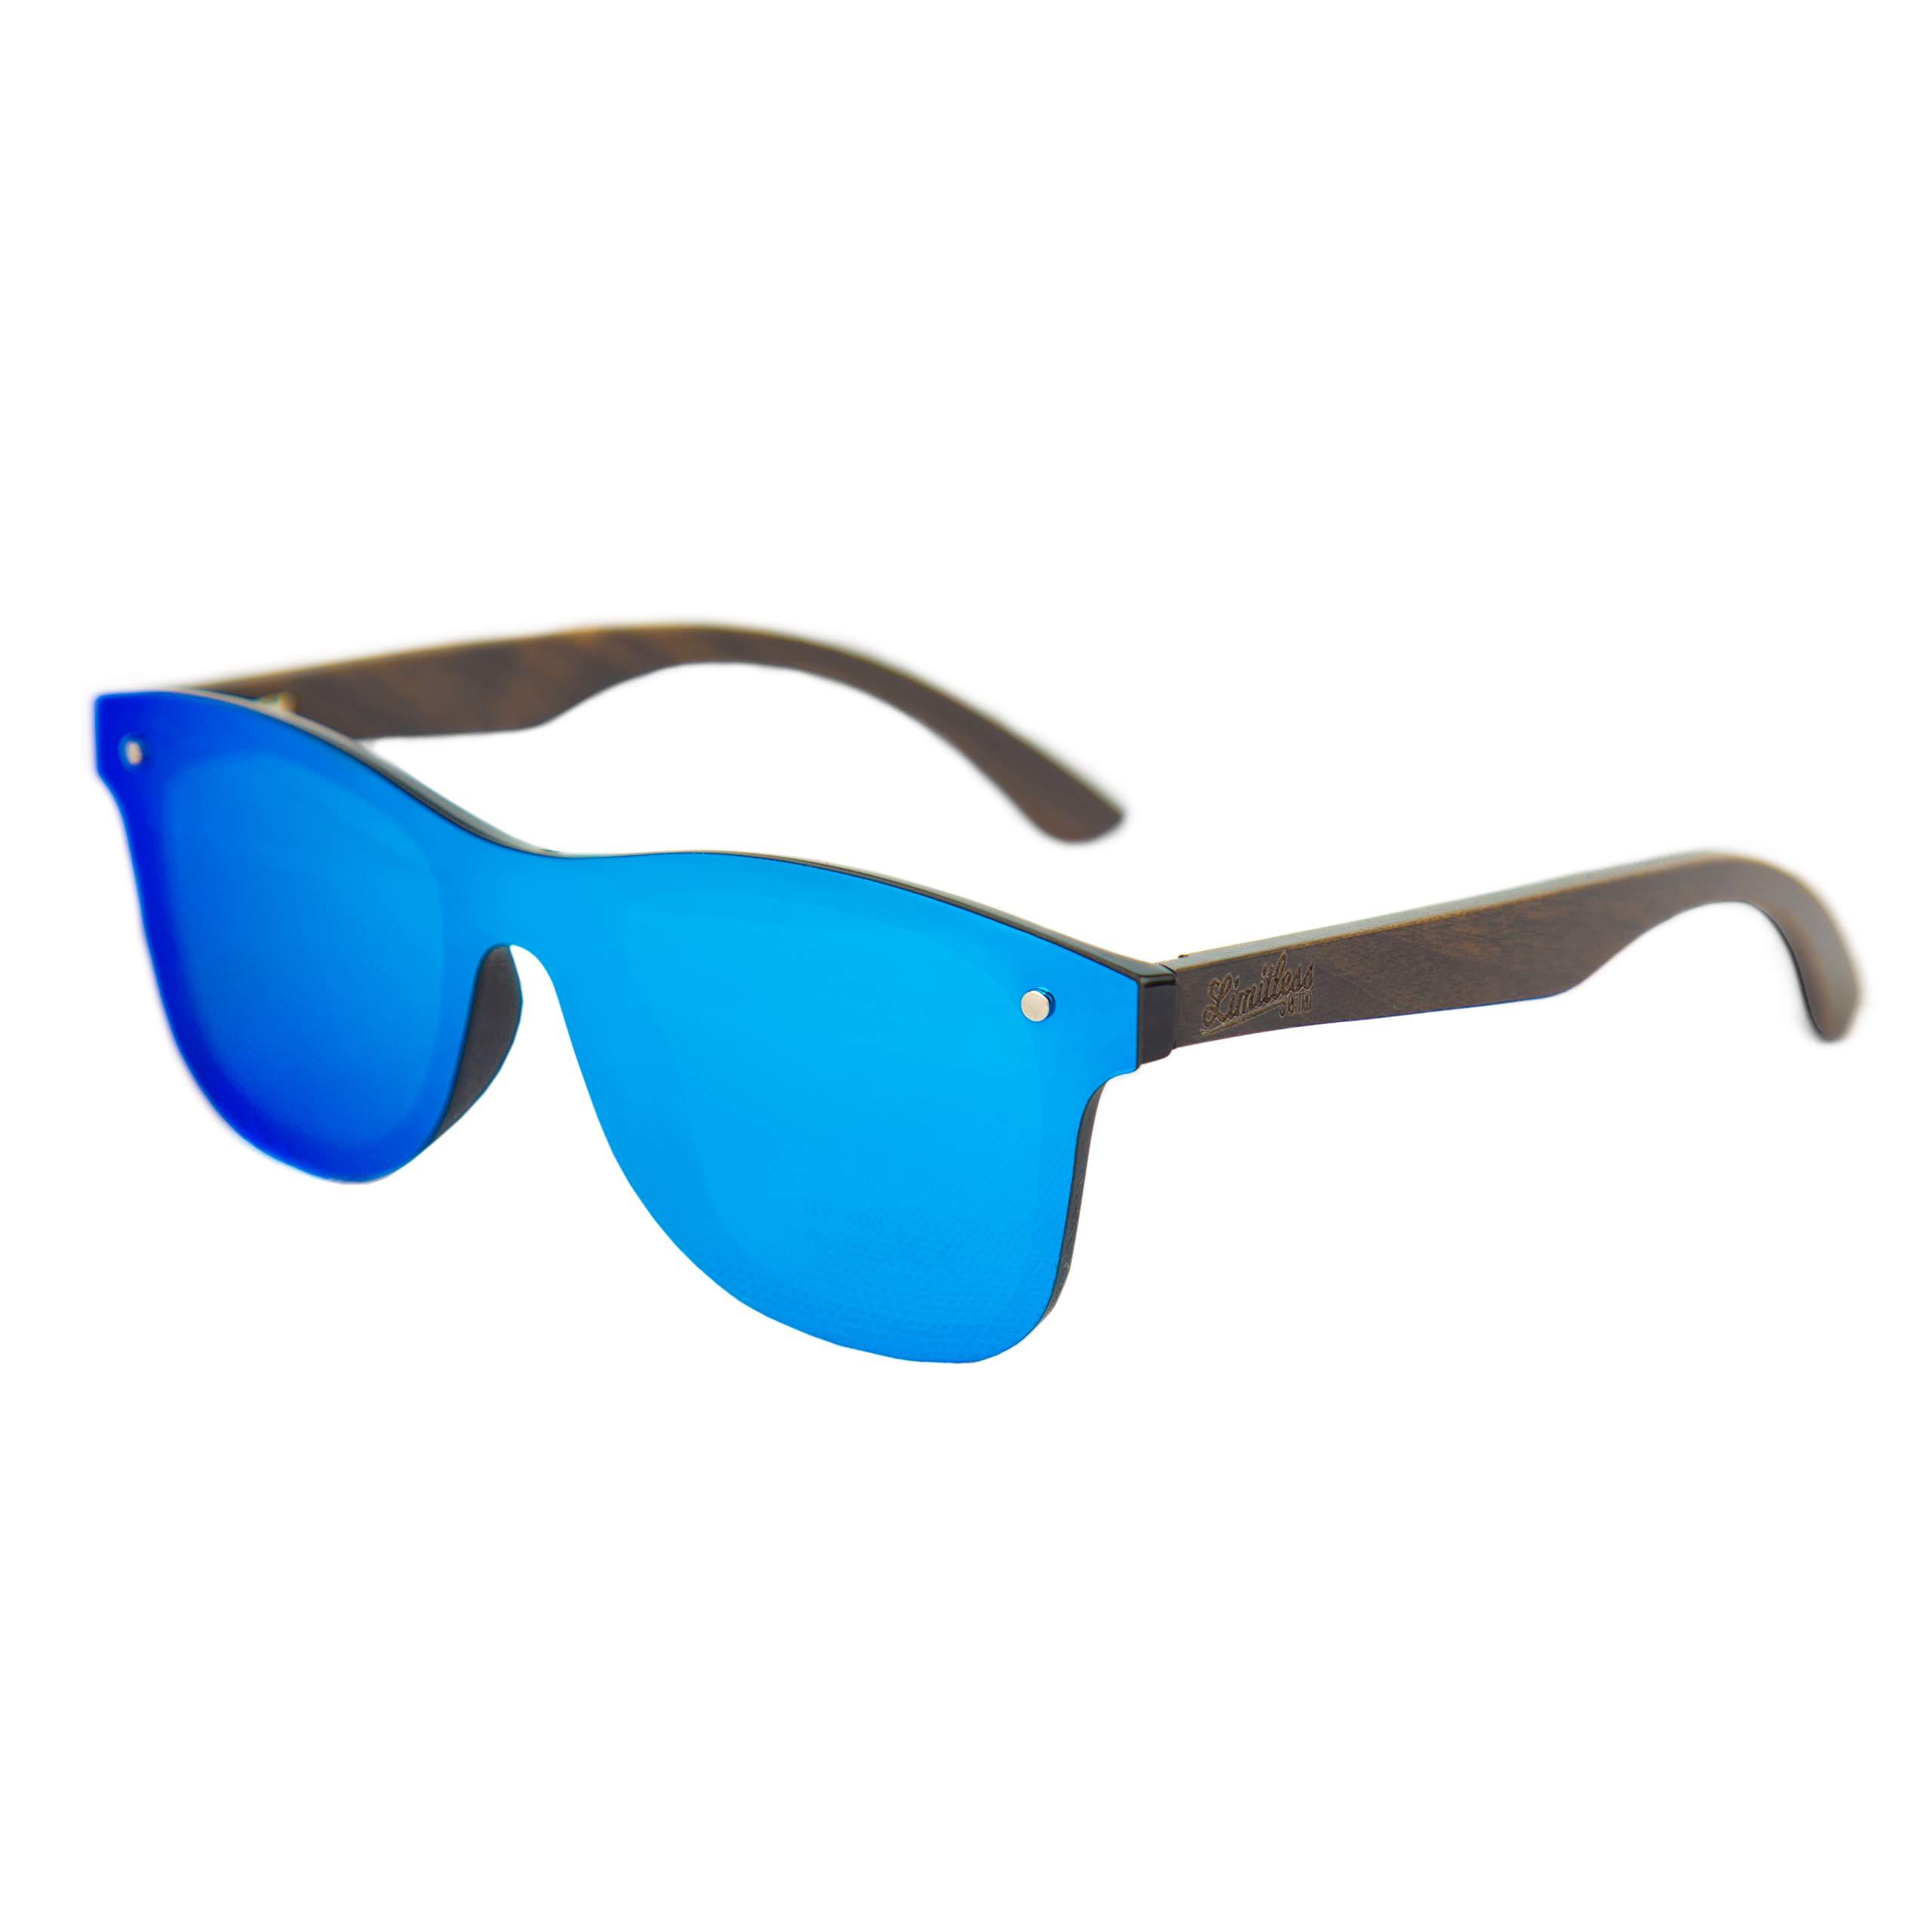 Limitless Wooden Sunglasses, Wooden Retro Frameless Sunglasses, Vintage Mirror UV400 Polarized Rimless Eyewear (Retro Blue, Blue)